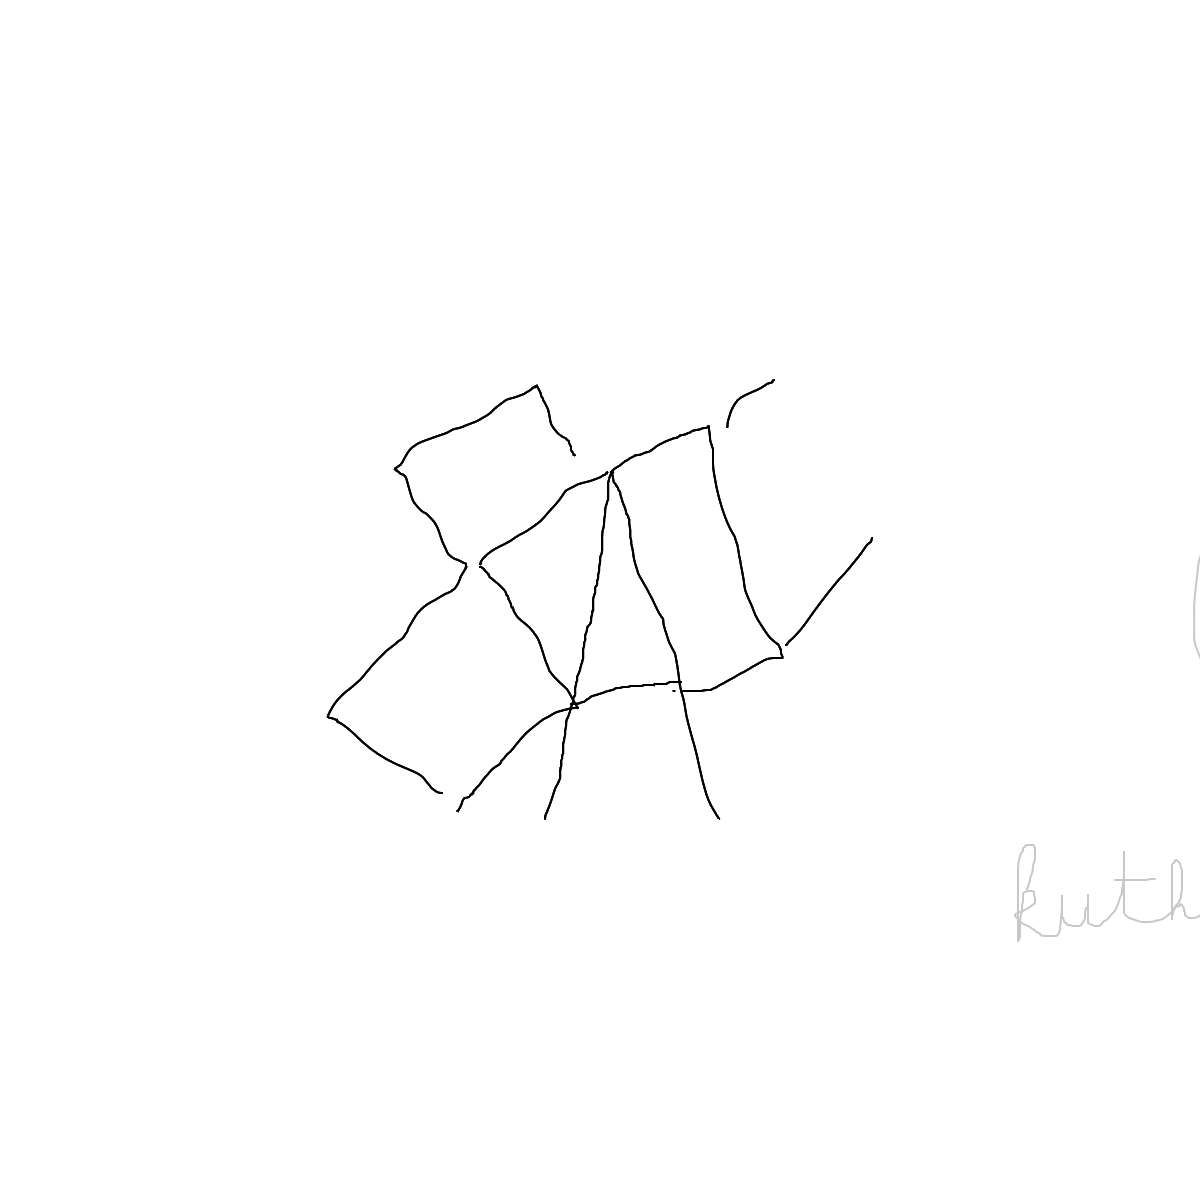 BAAAM drawing#8233 lat:51.2089691162109400lng: 3.2536389827728270